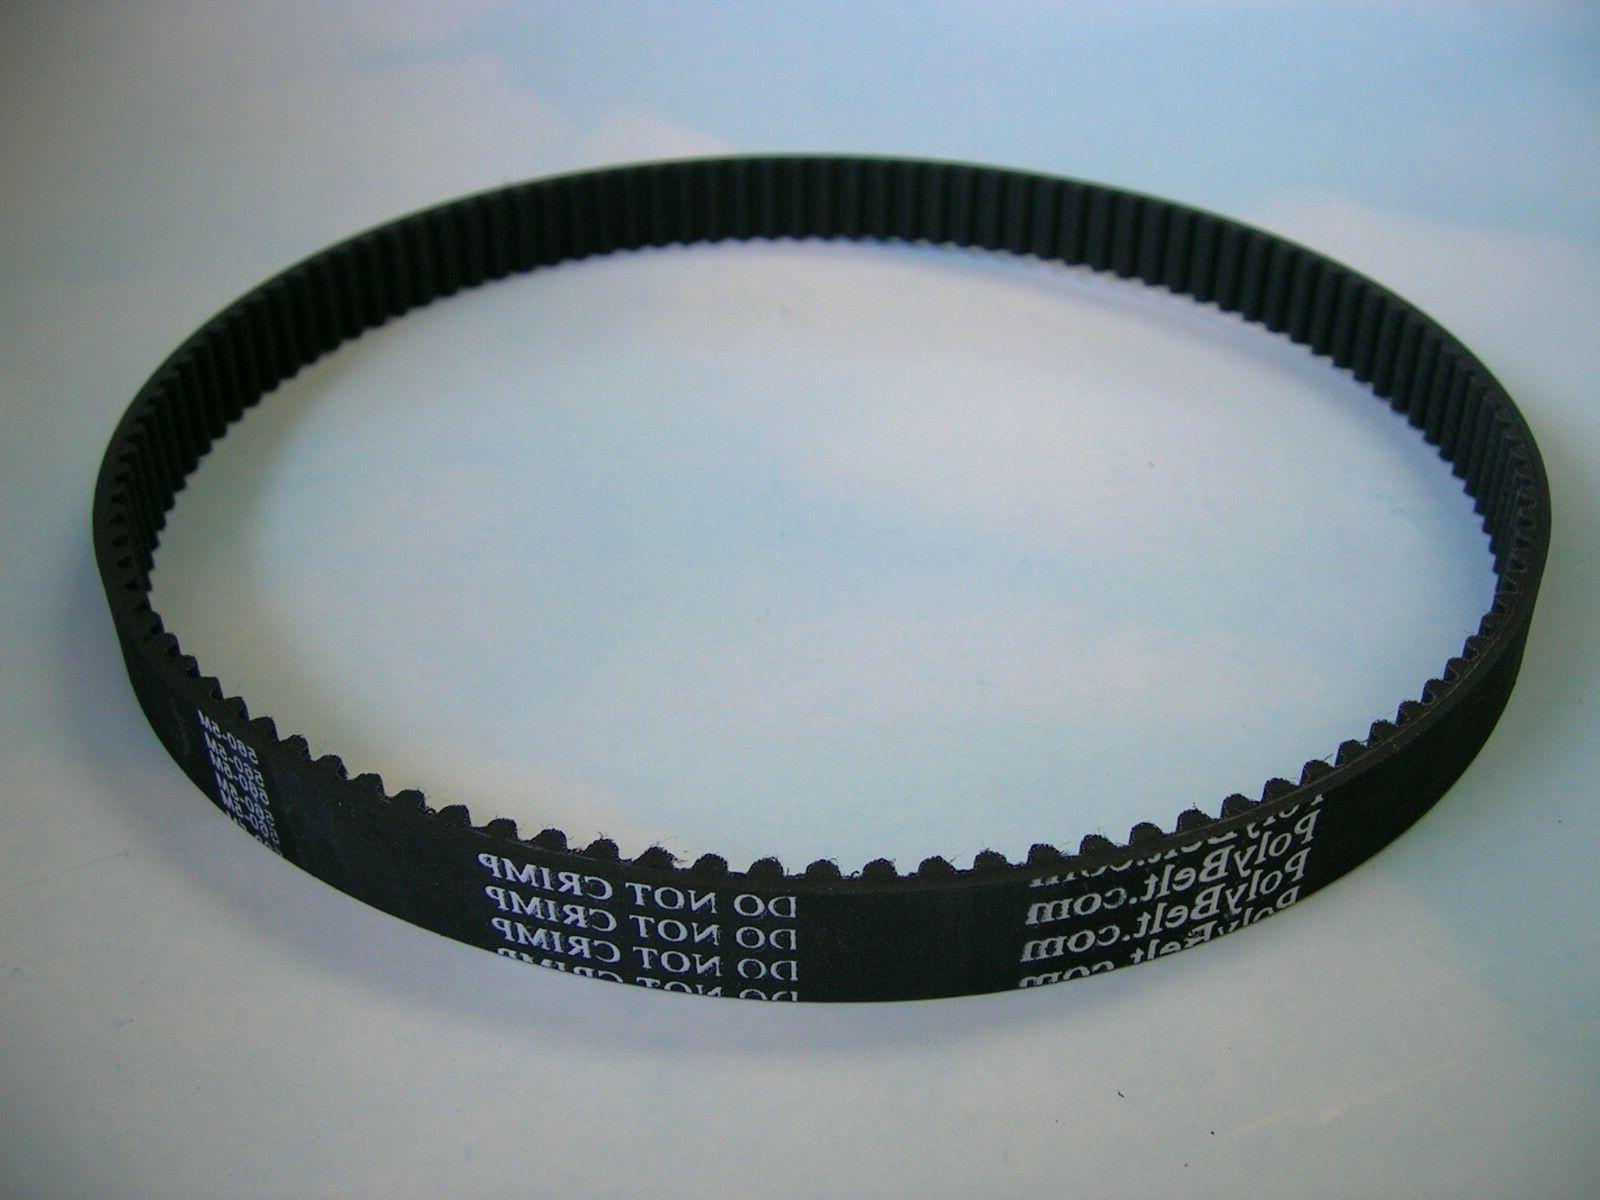 5891 bread maker machine replacement cogged belt